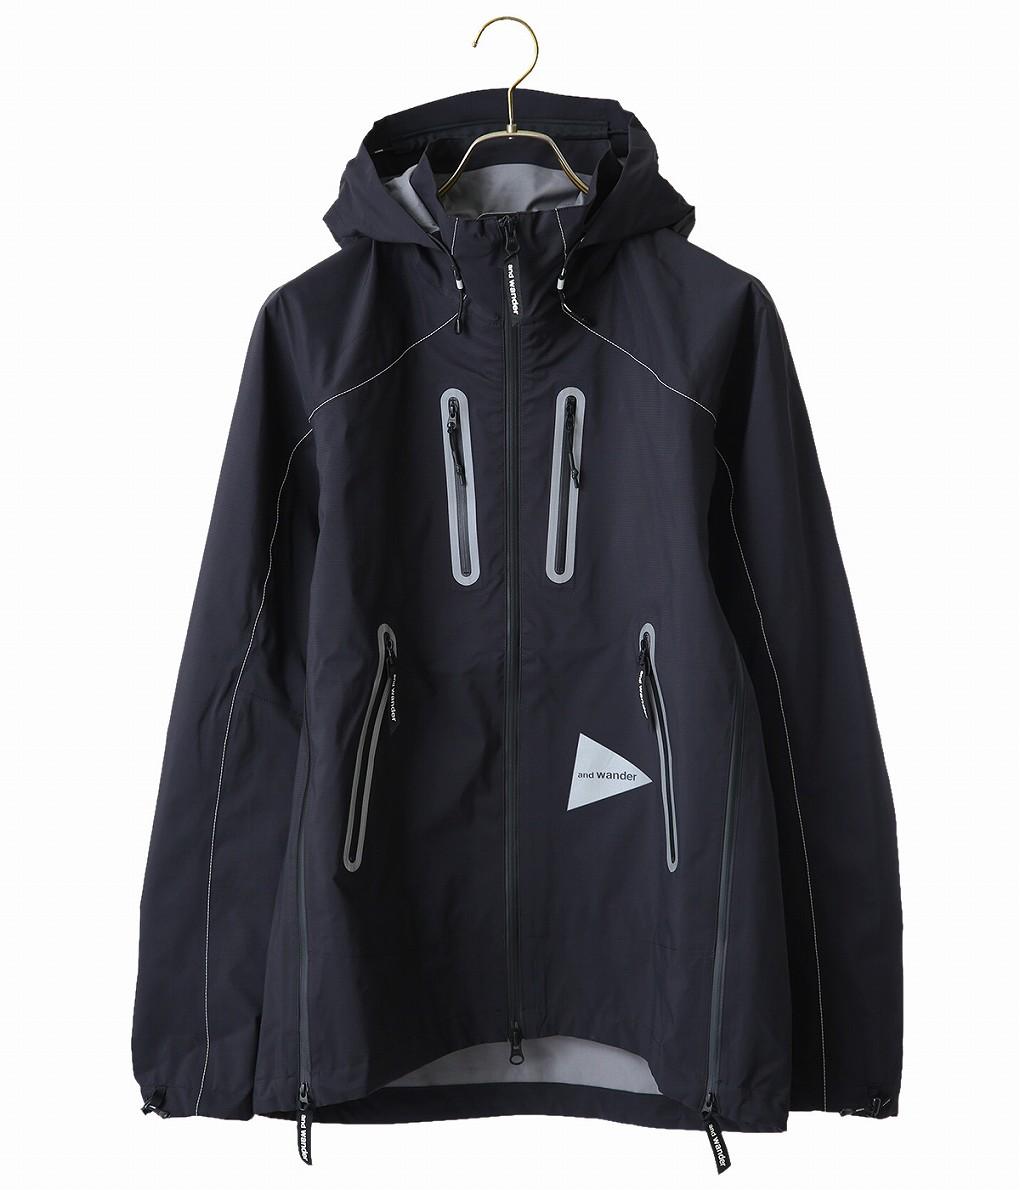 and wander / アンドワンダー : e vent jacket : イーベント ジャケット / 全2色 : AW83-FT607 【PIE】